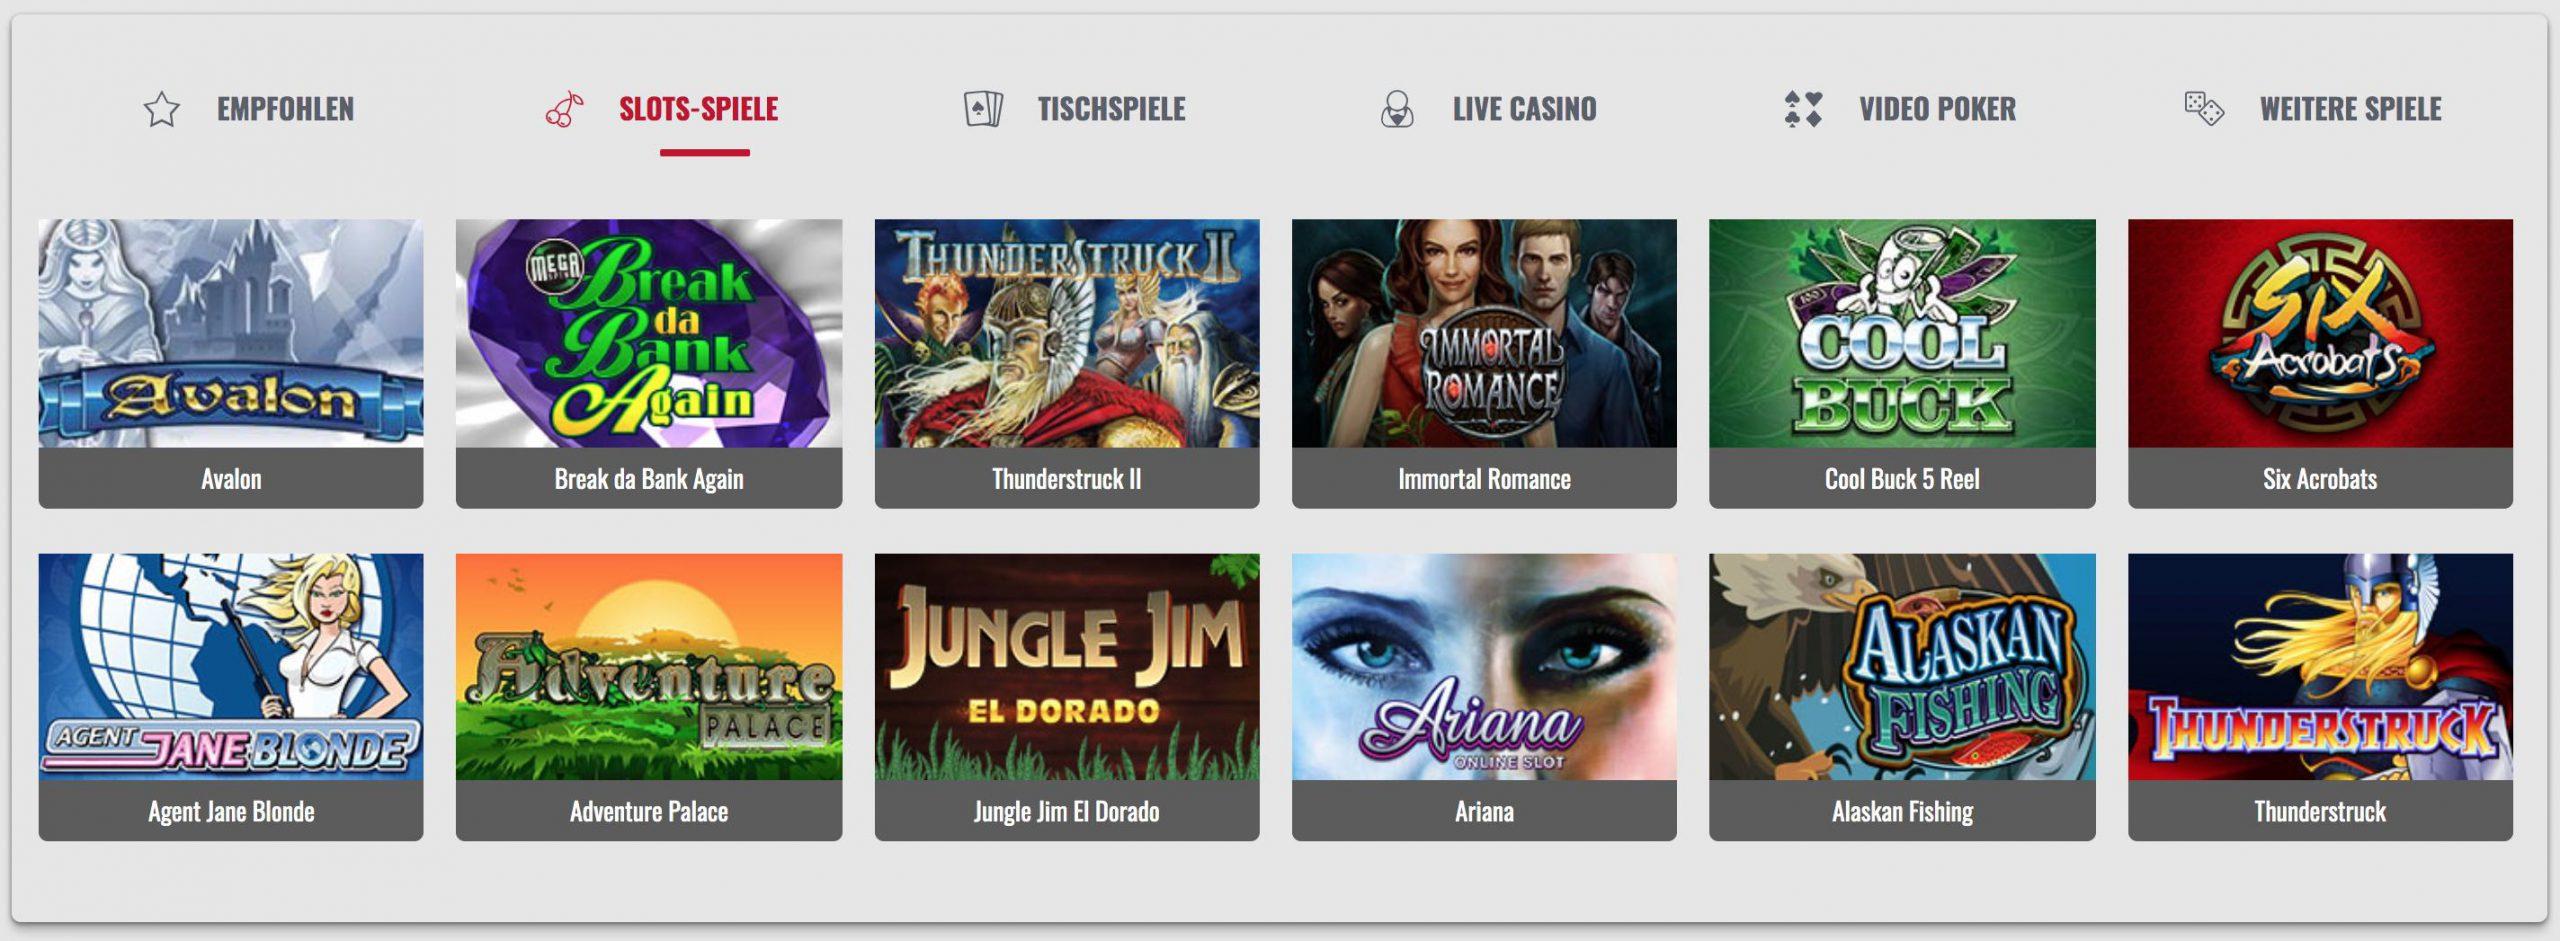 Slot Automaten Spiele